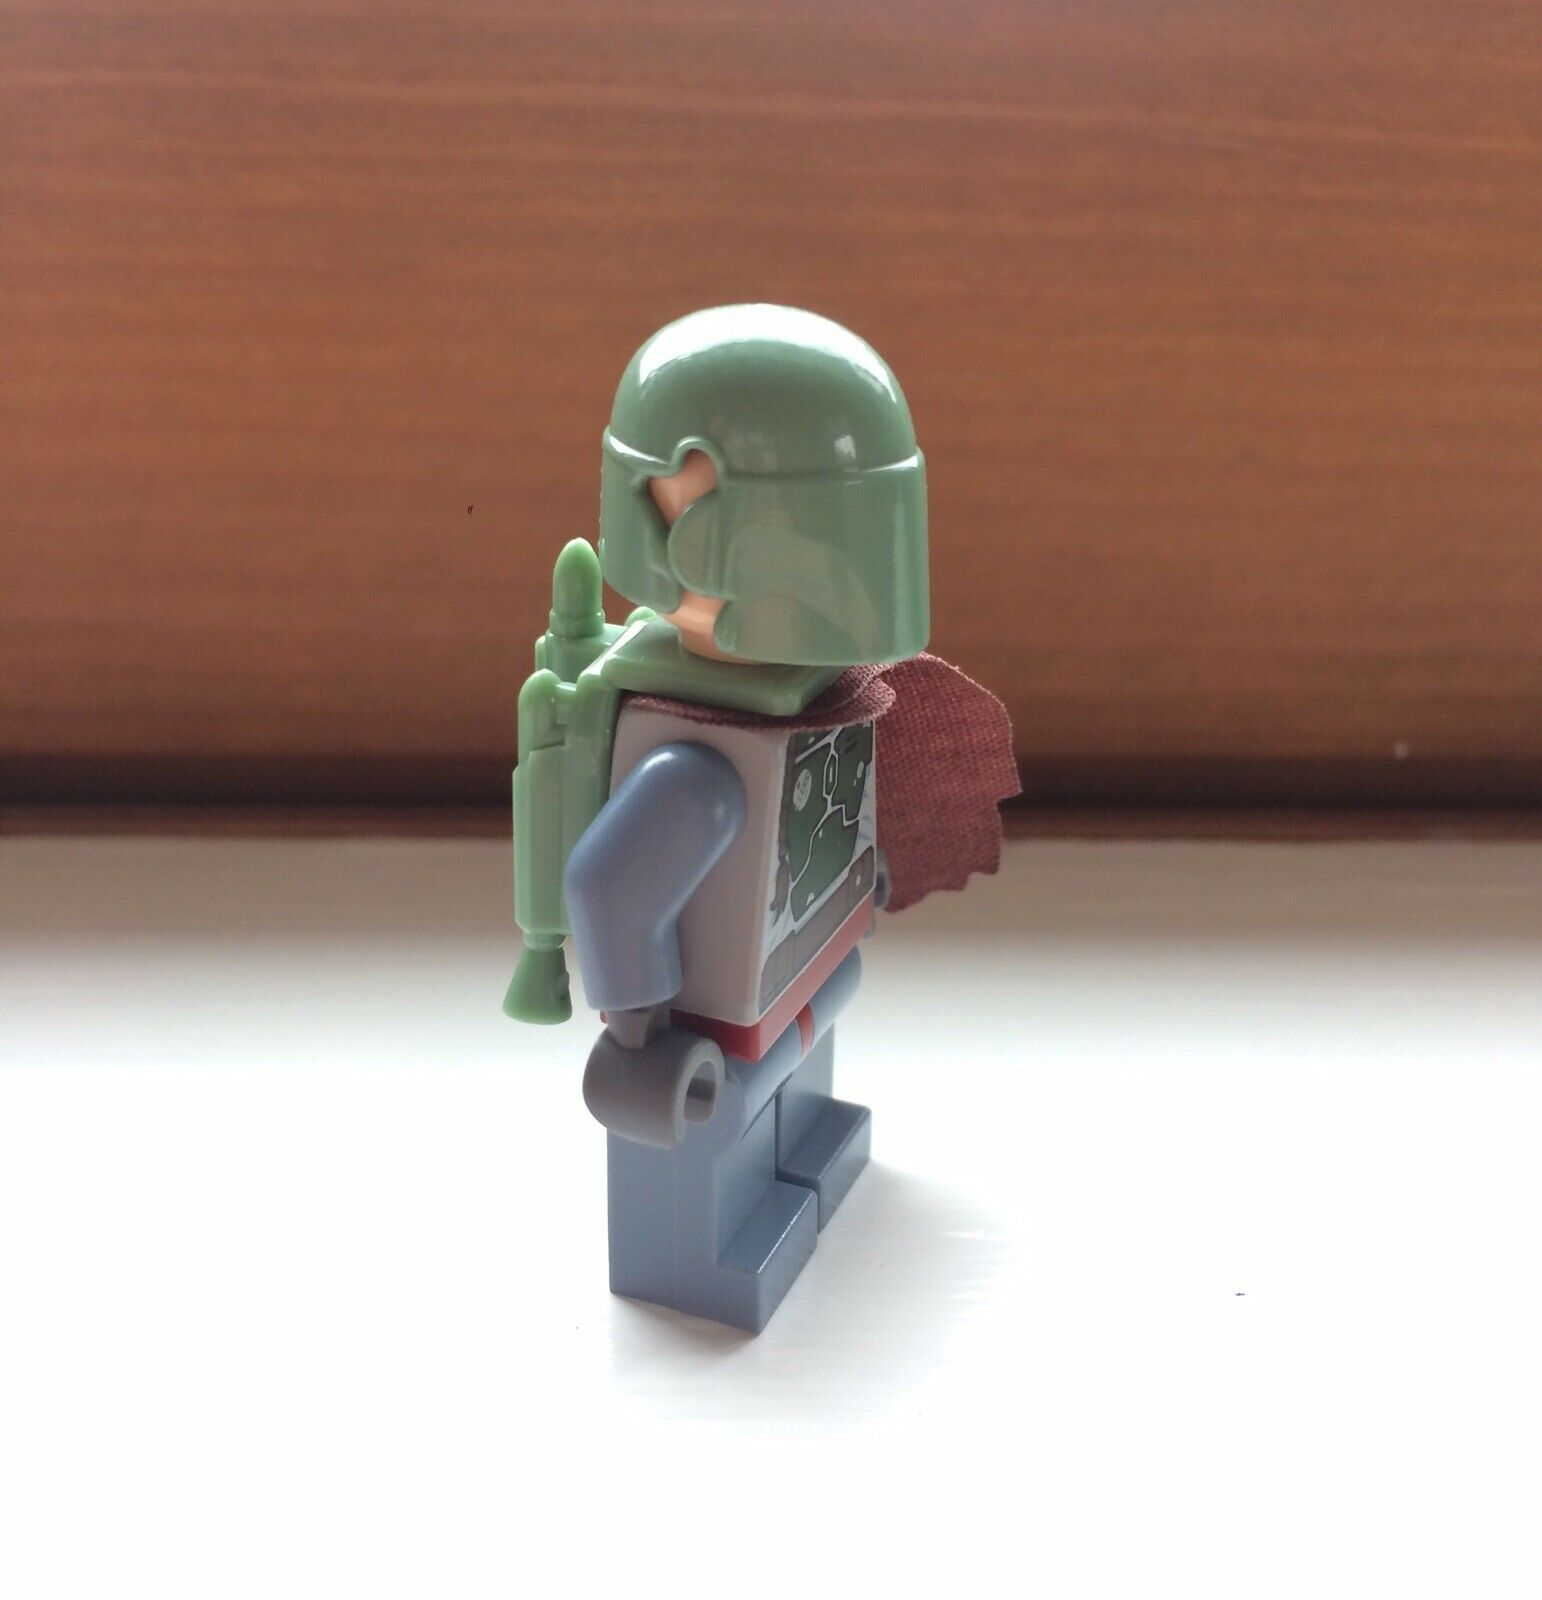 Lego Stern Wars Factory Mold Defect Error Boba Fett Helmet - Extremely Rare